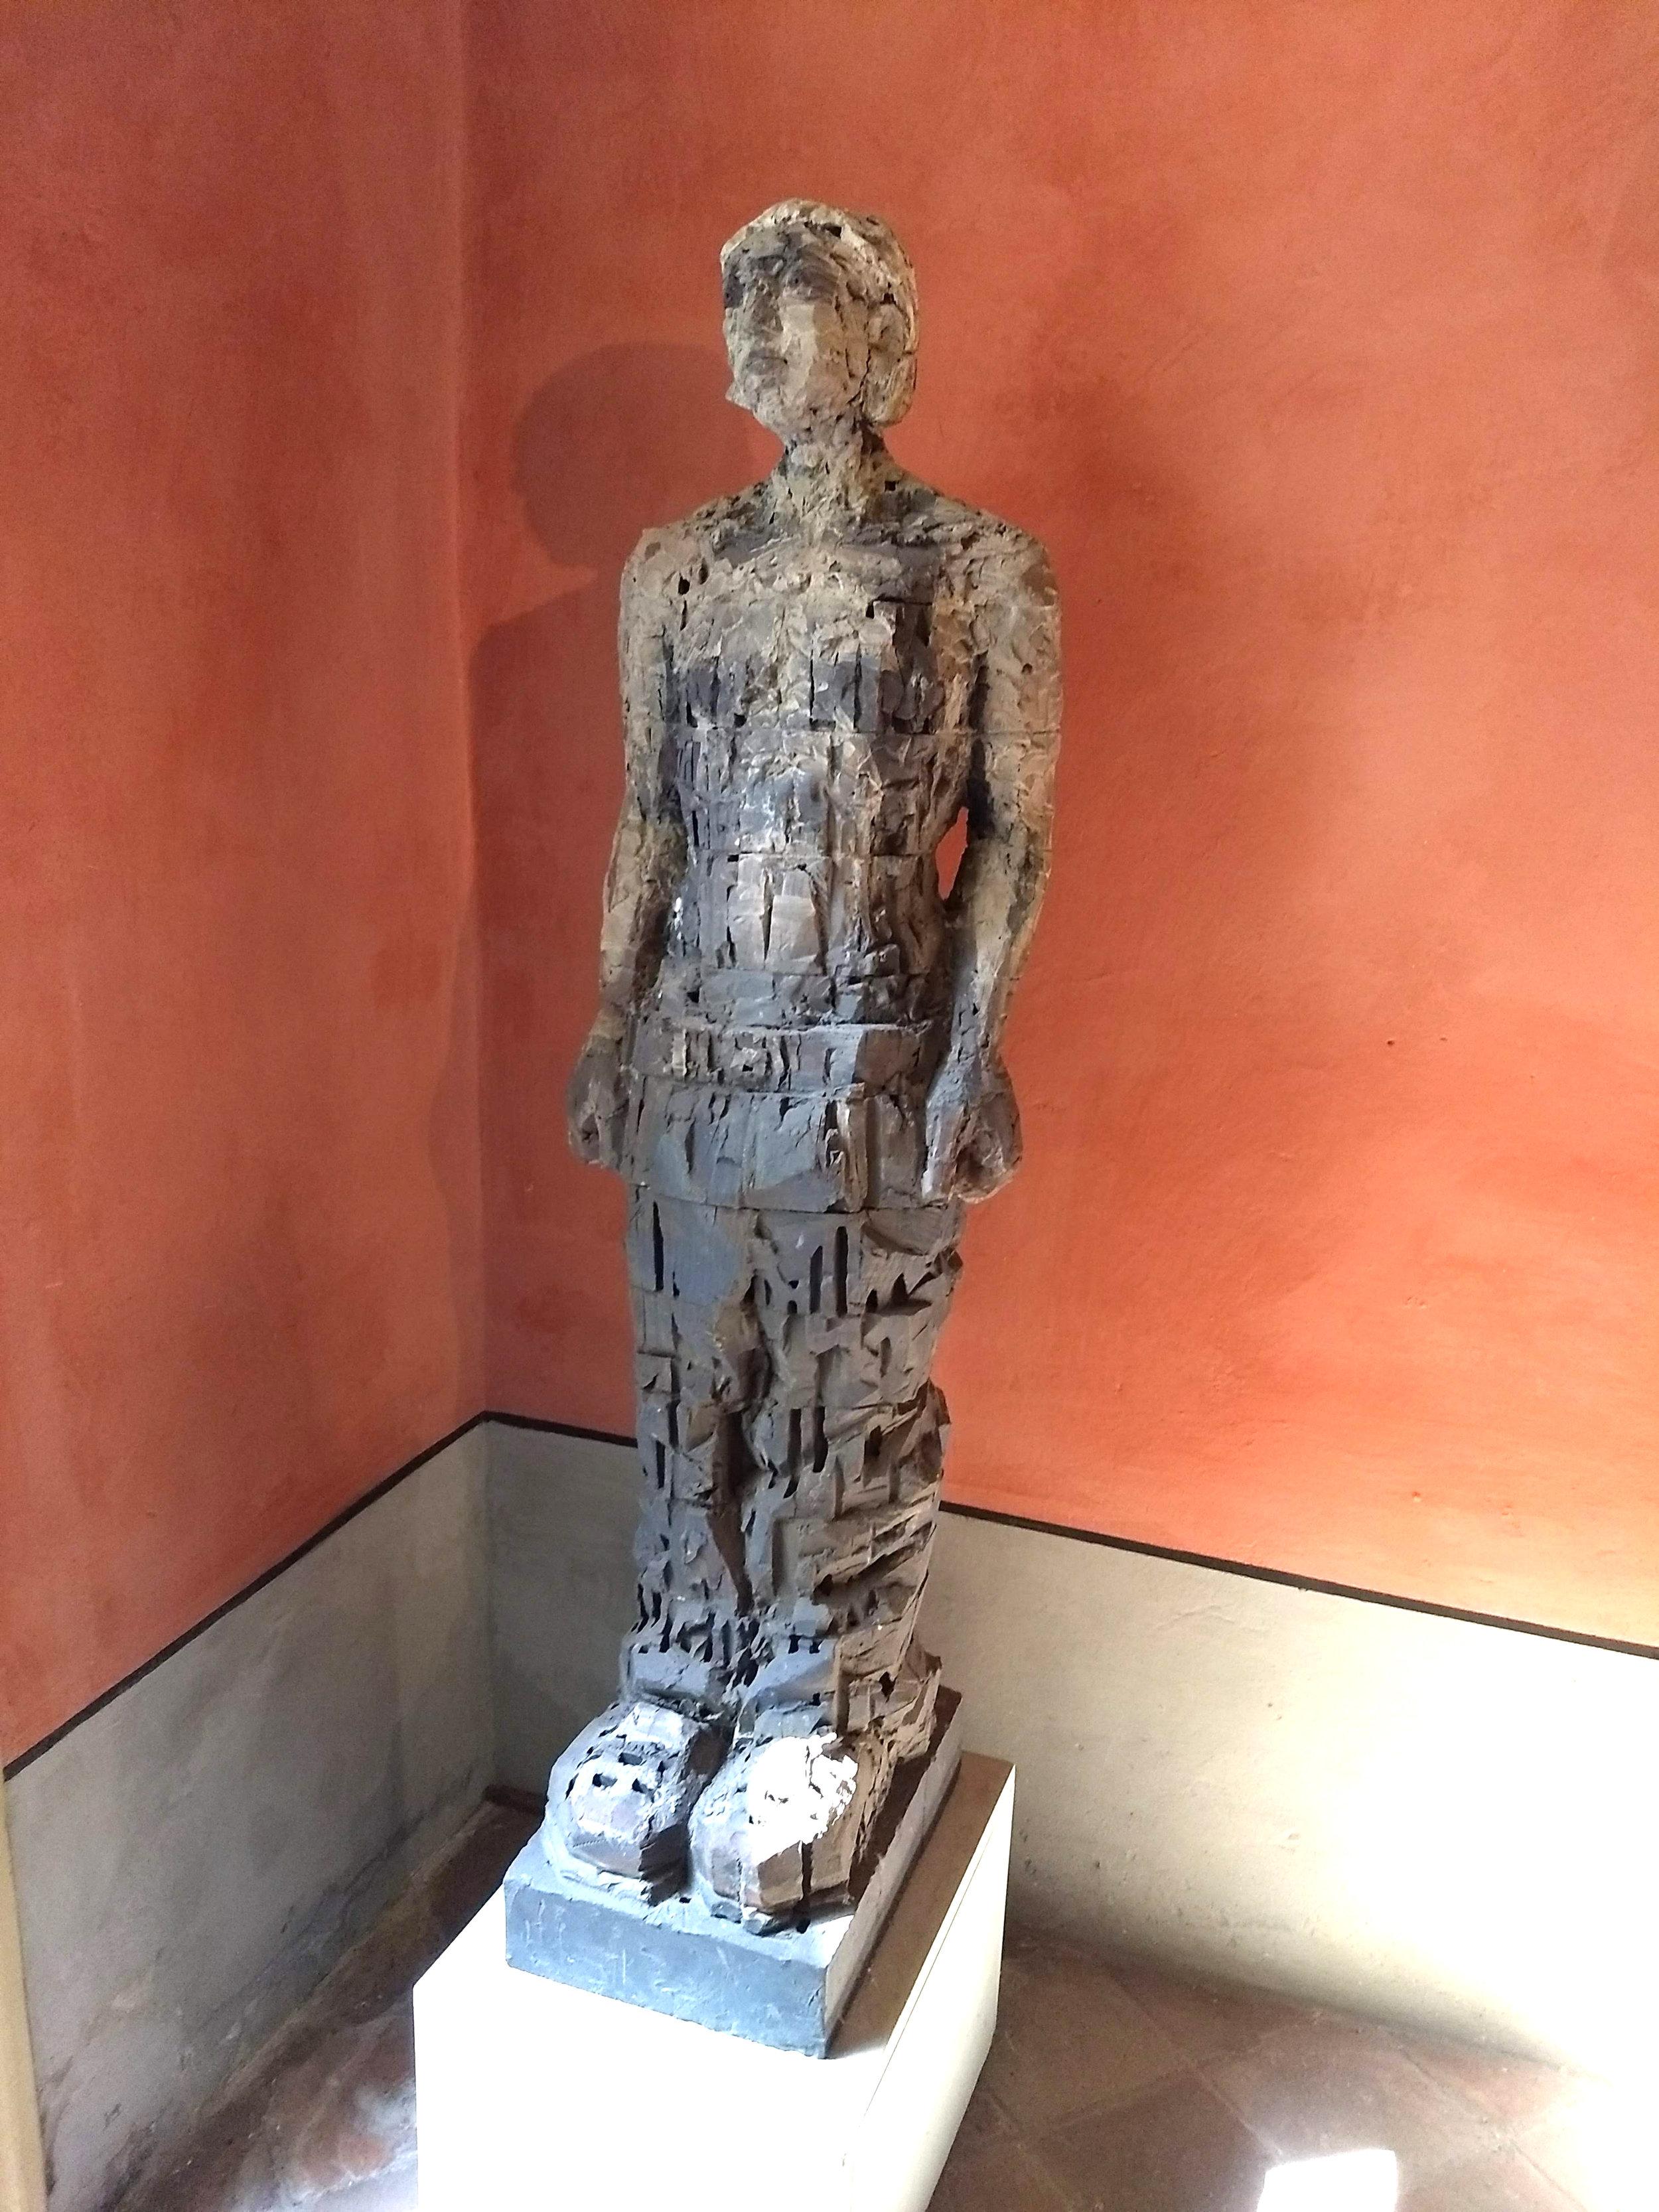 life size sculpture